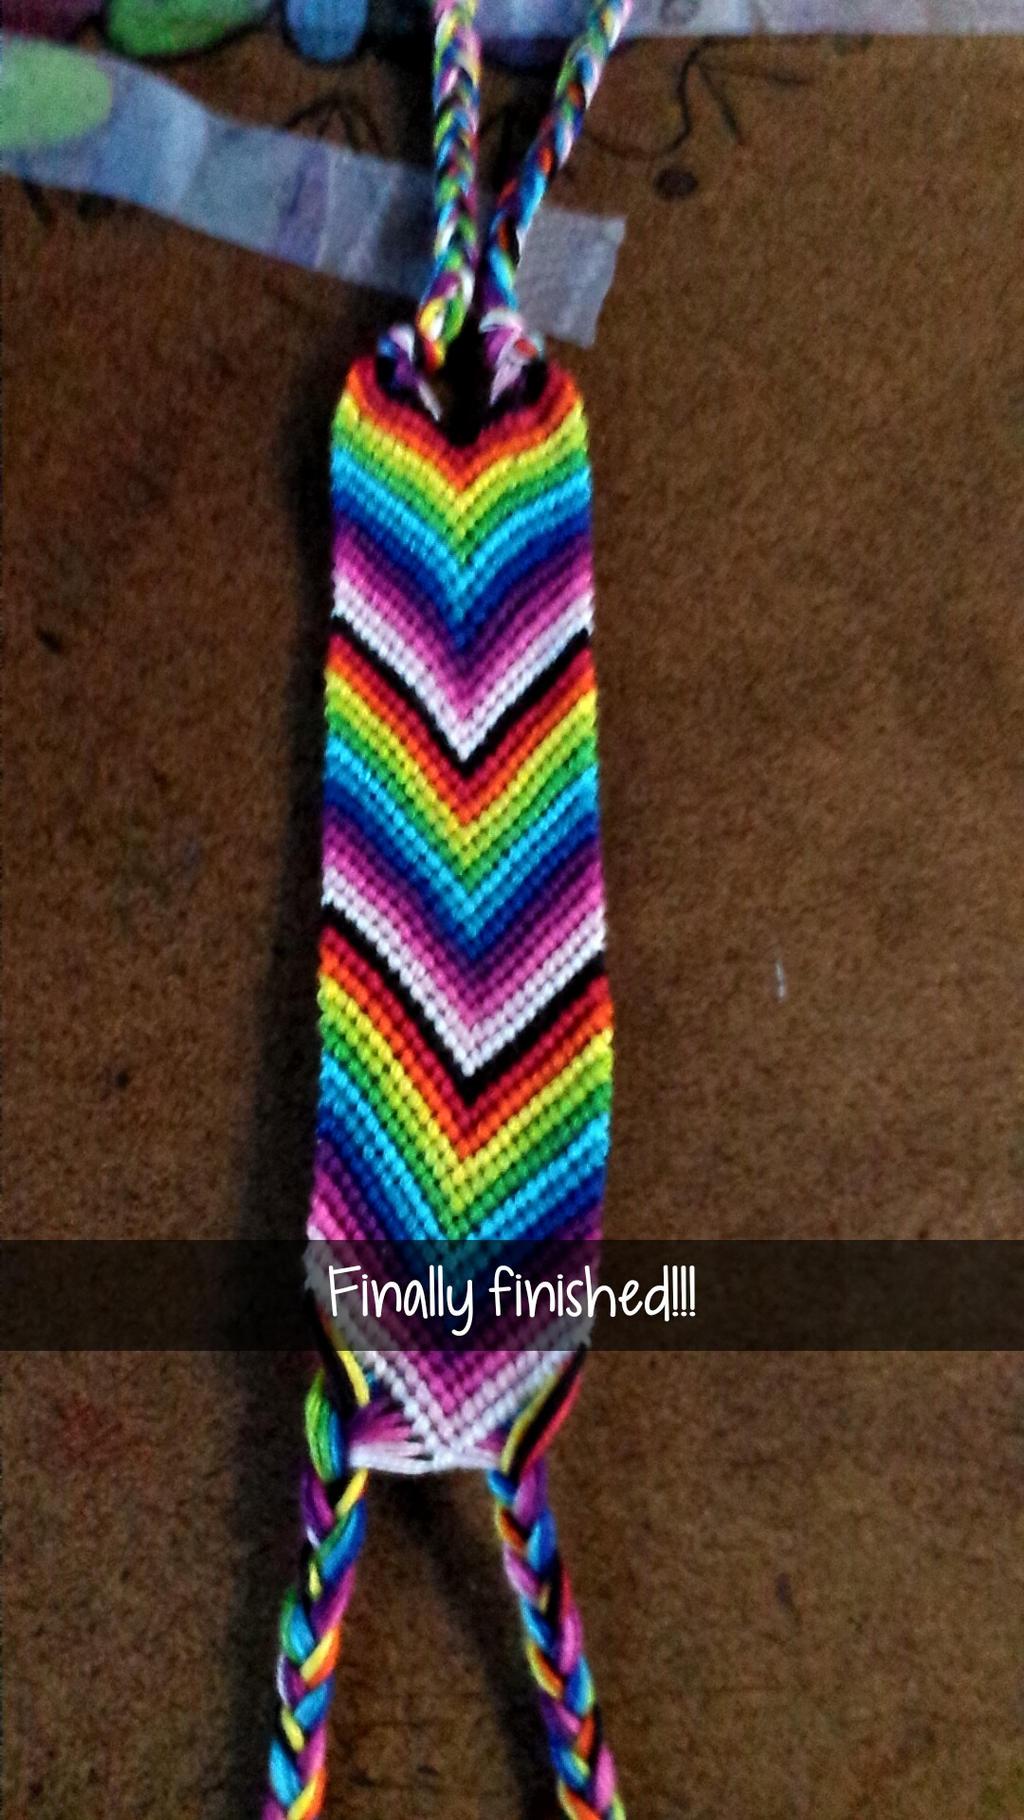 Chevron bracelet - Rainbow Chevron Friendship Bracelets By Annabellemarie3 Rainbow Chevron Friendship Bracelets By Annabellemarie3